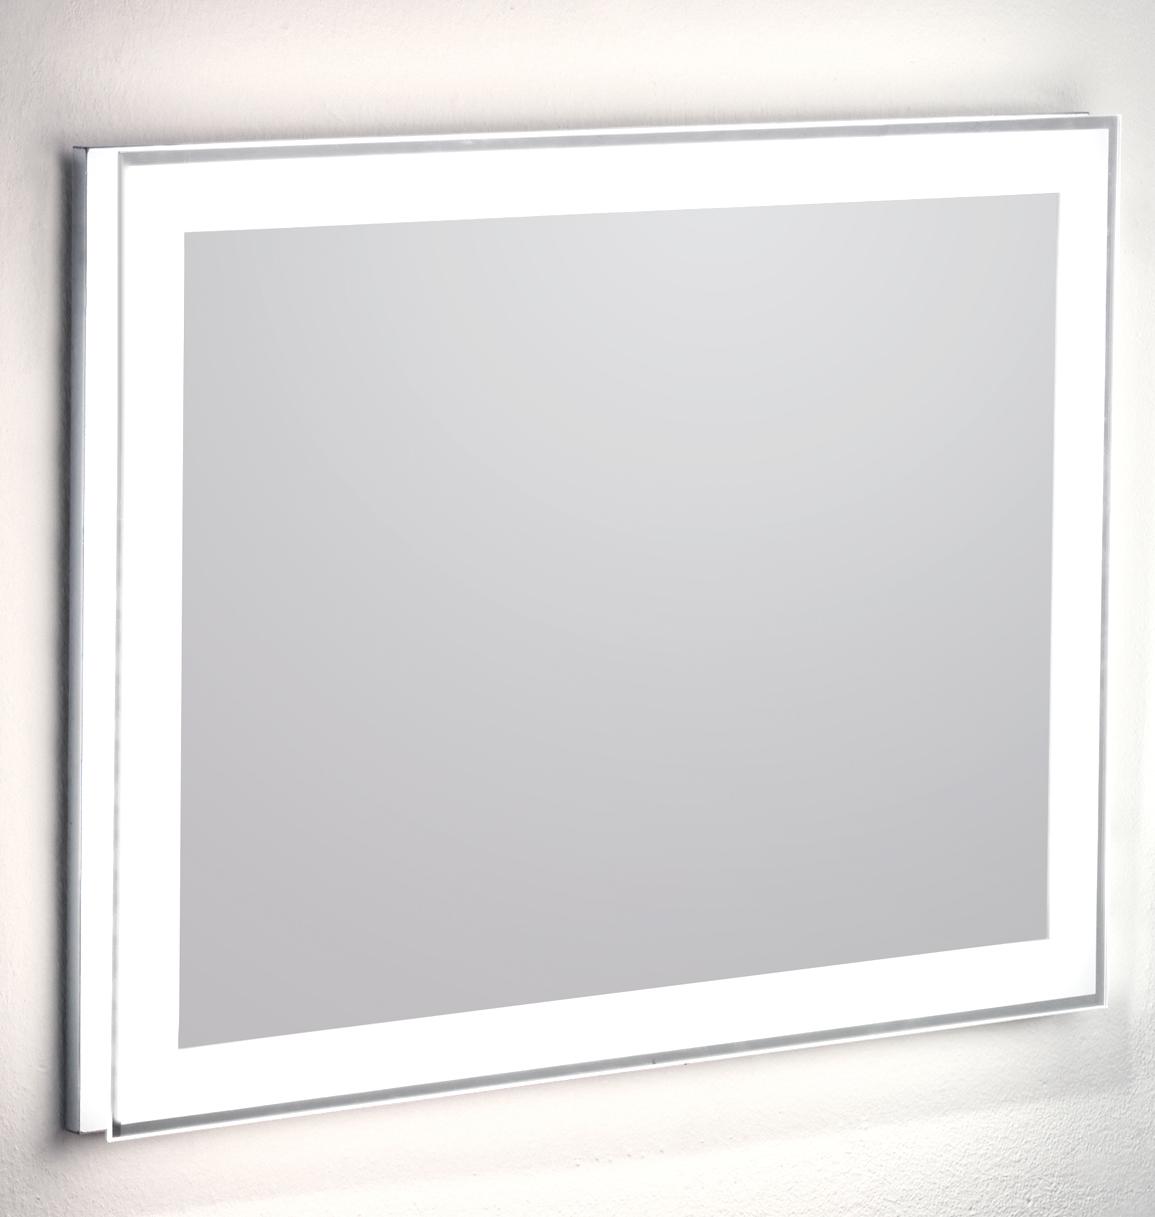 Espelhos ORBY, ORBY LED